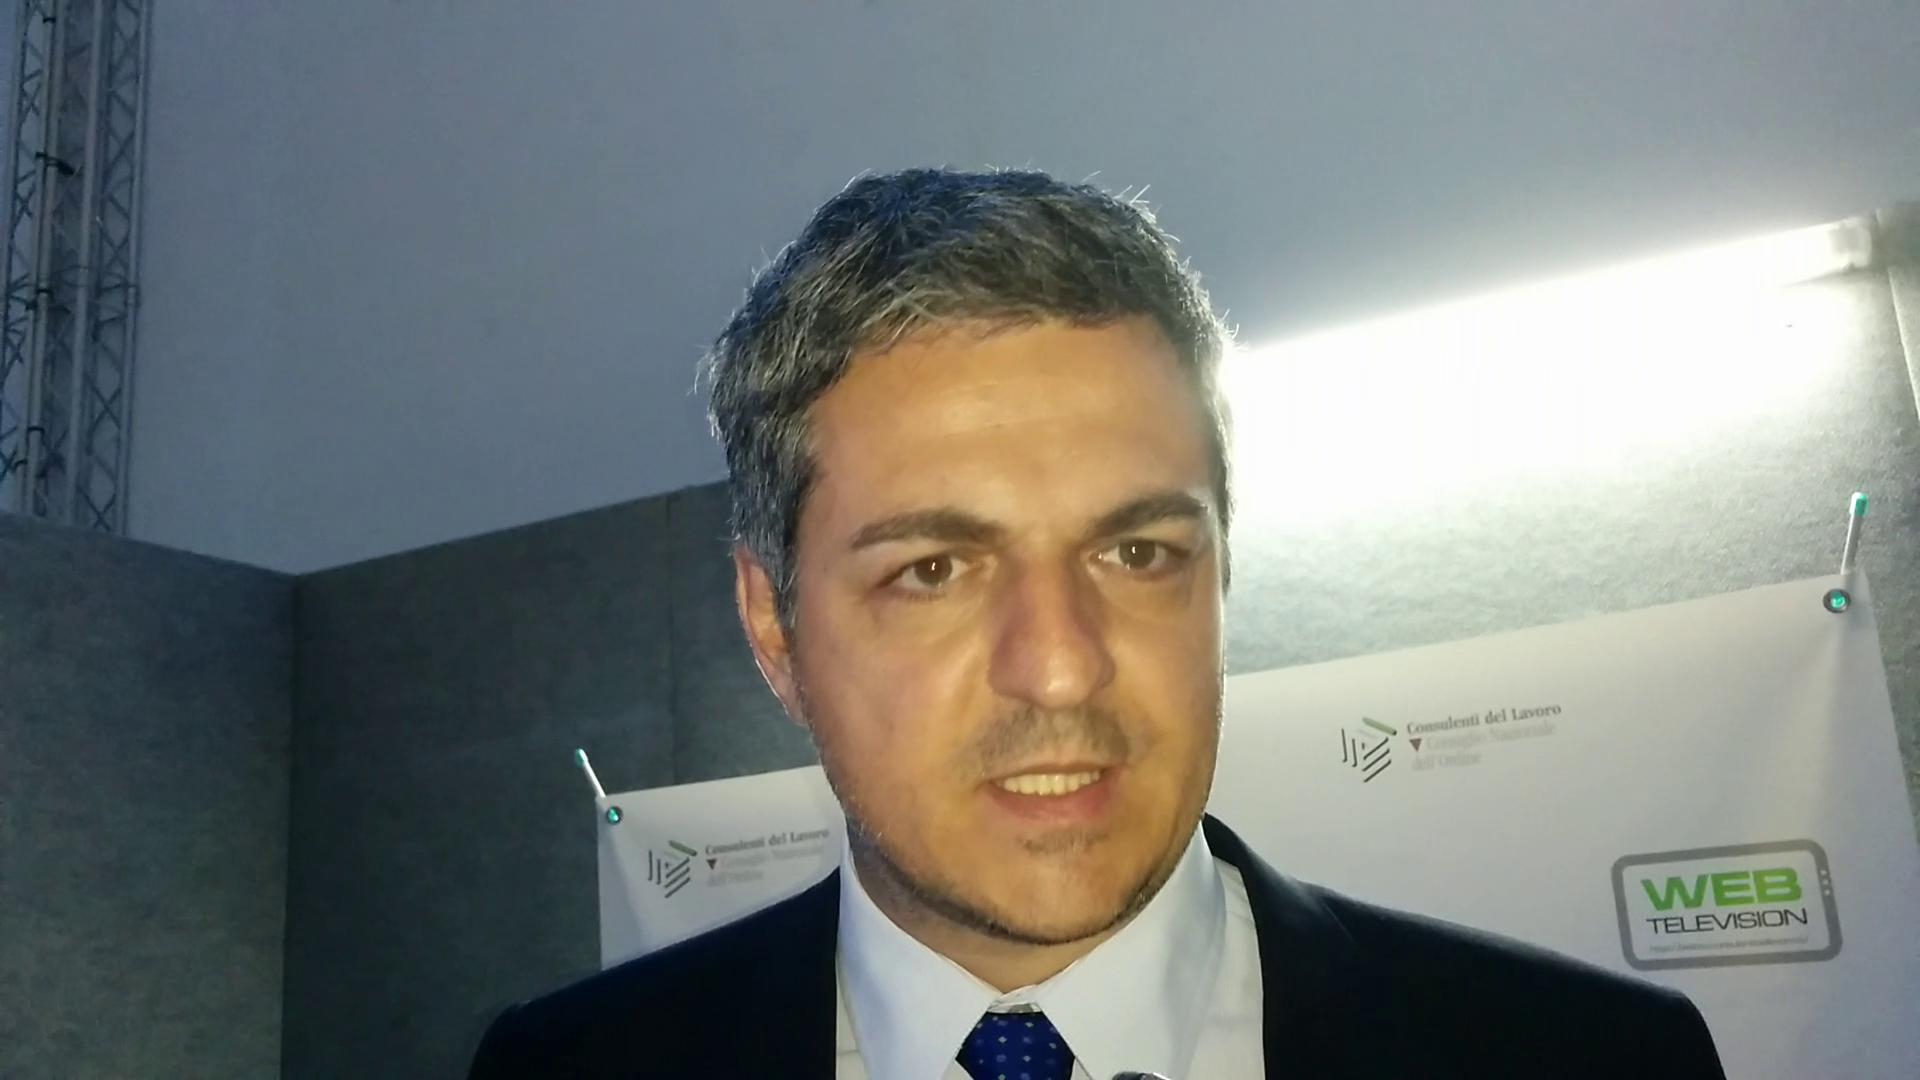 Simone Baldelli - Vicepresidente Camera dei Deputati